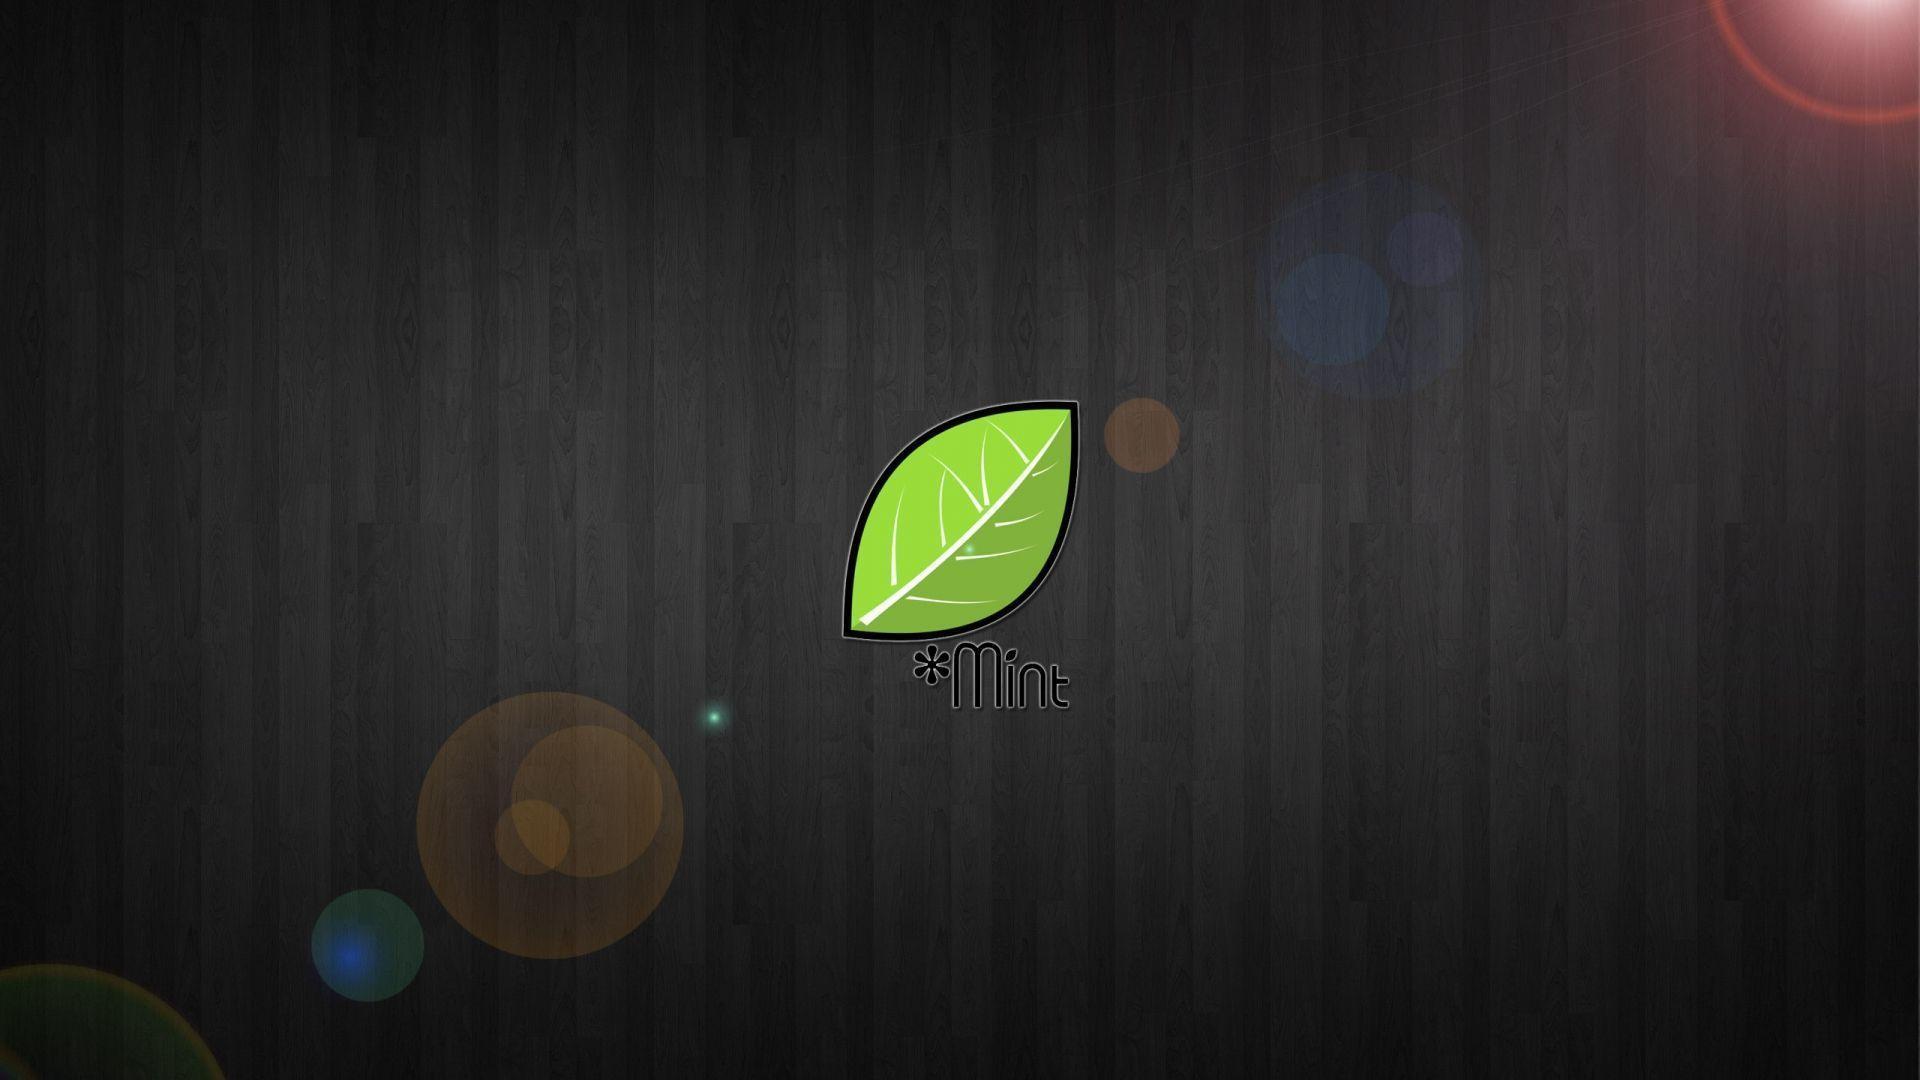 Linux Mint Wallpaper | High Quality Wallpaper